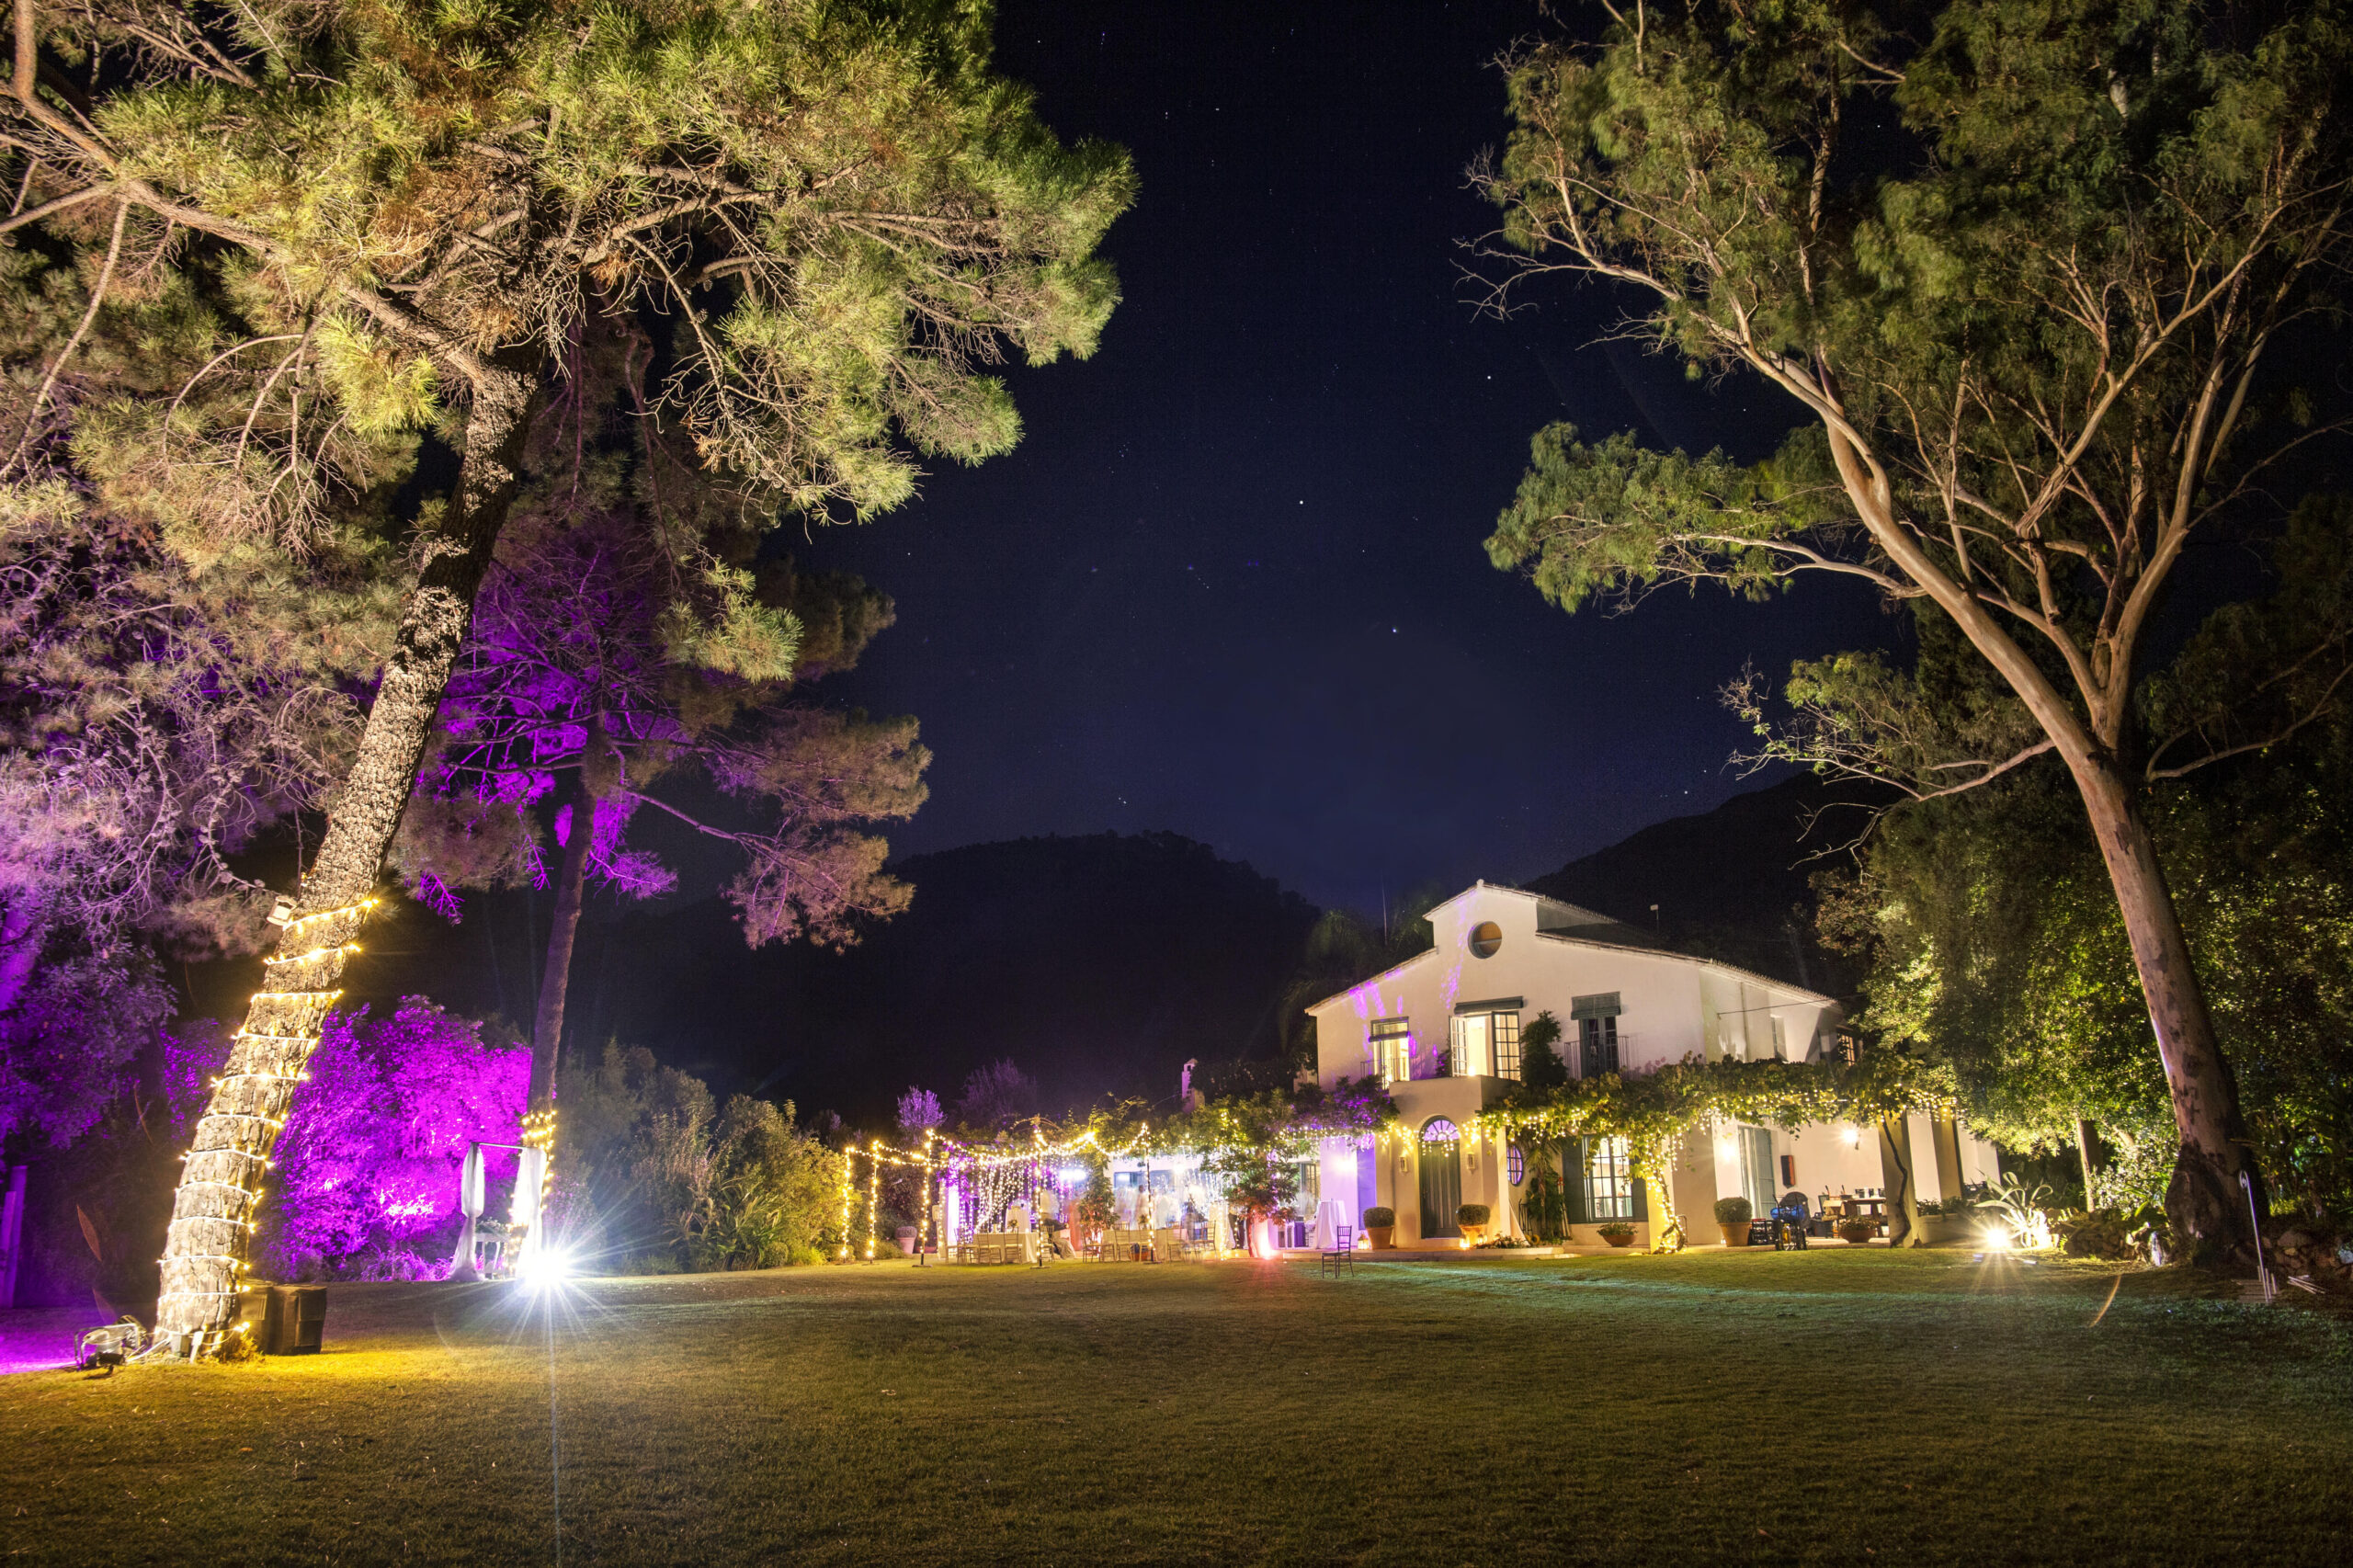 Night view of a stunning wedding villa in Spain.